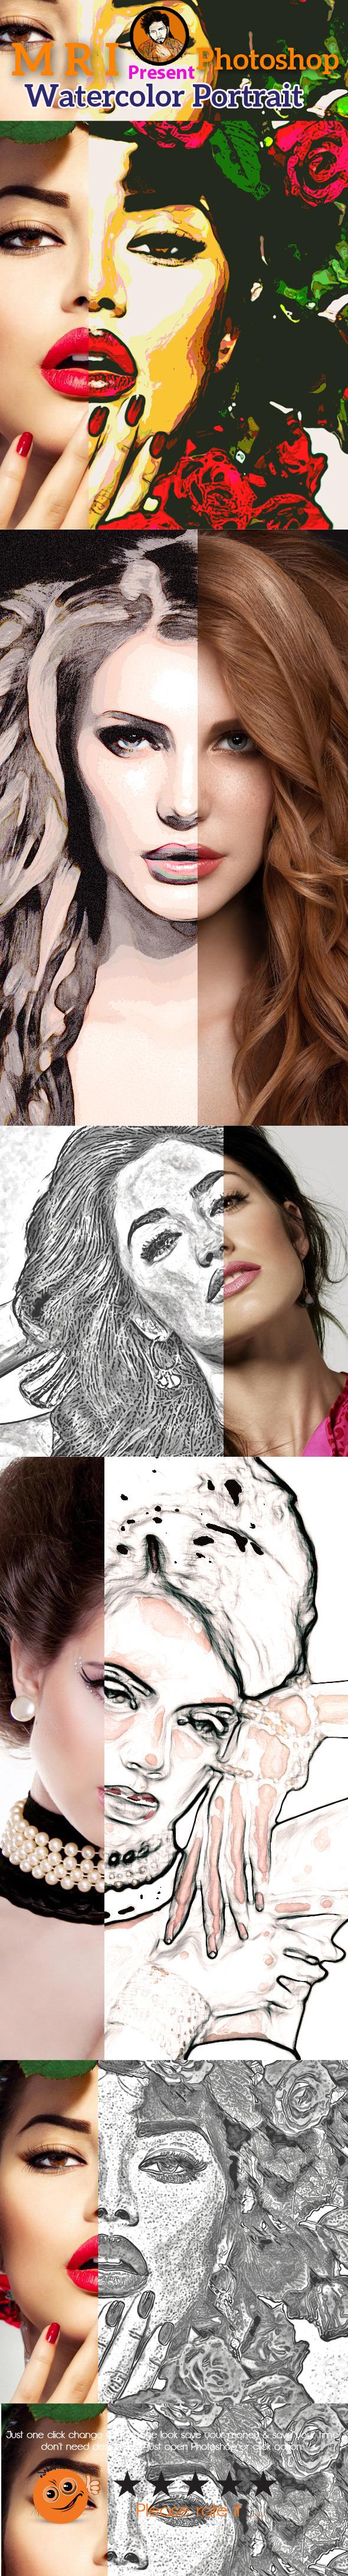 Watercolor Portrait - Photo Effects Actions